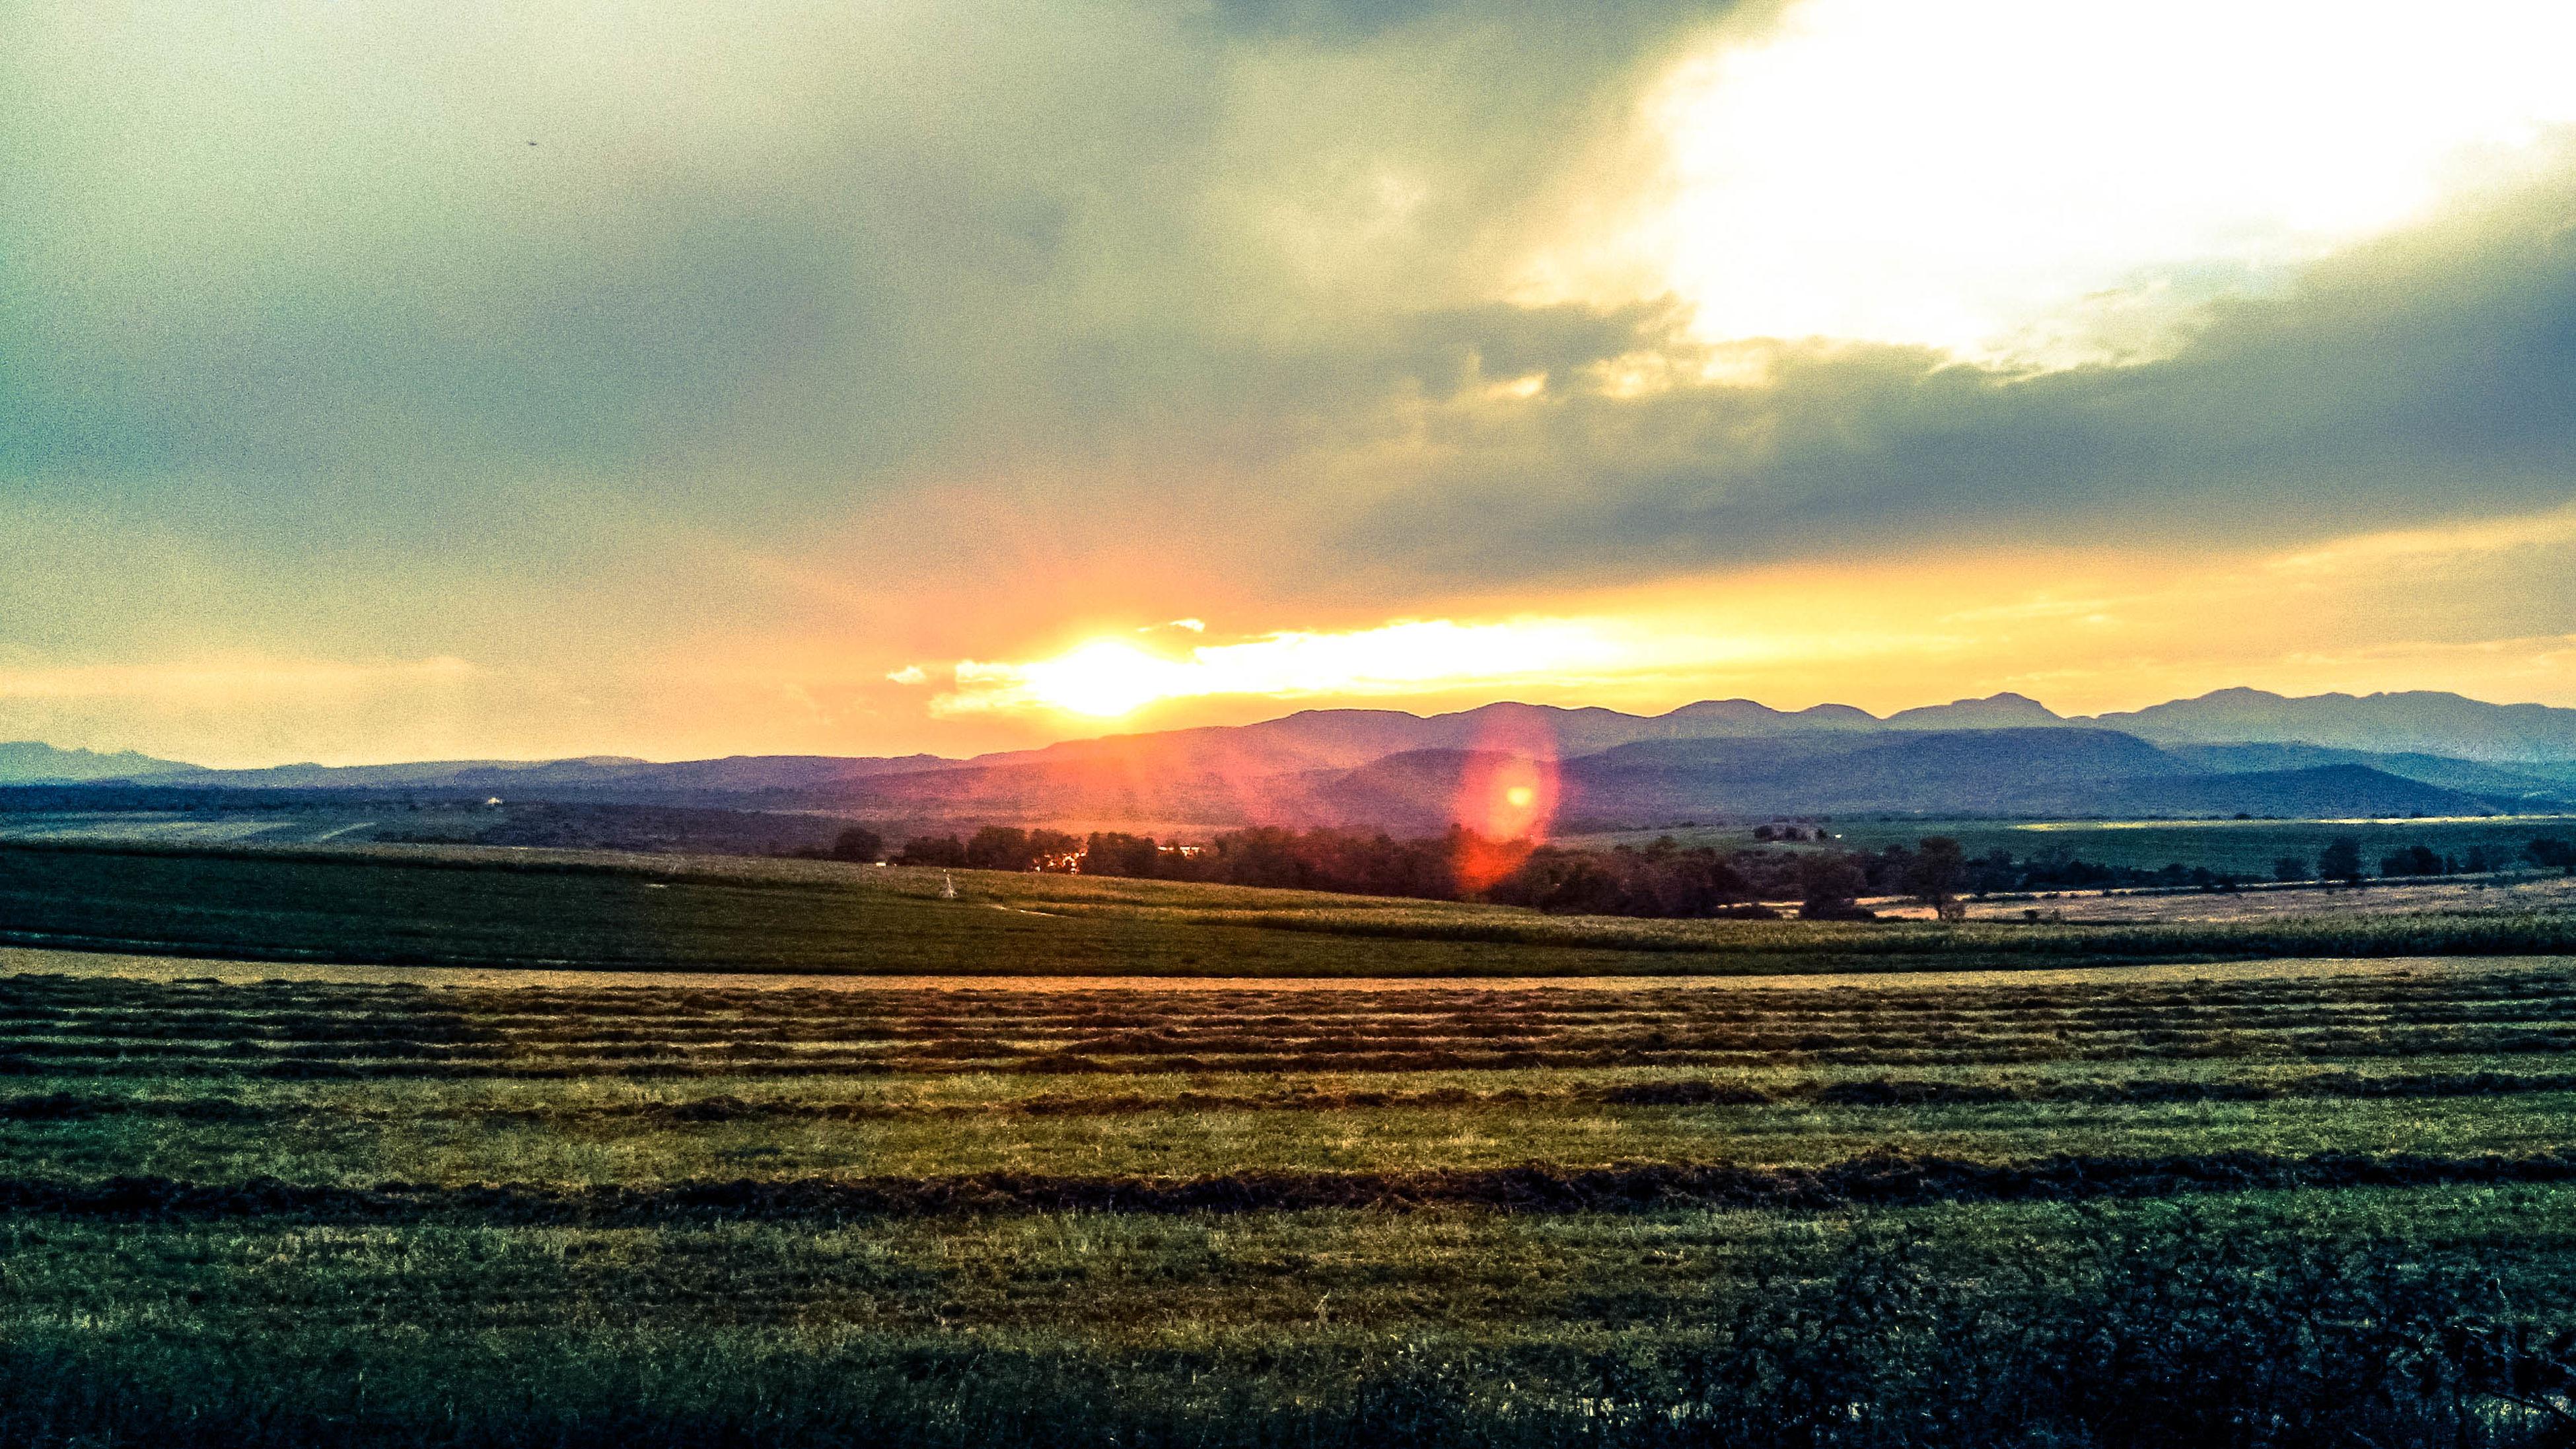 sunset, sun, tranquil scene, landscape, scenics, sky, tranquility, beauty in nature, field, rural scene, cloud - sky, nature, sunbeam, idyllic, orange color, sunlight, agriculture, grass, farm, lens flare